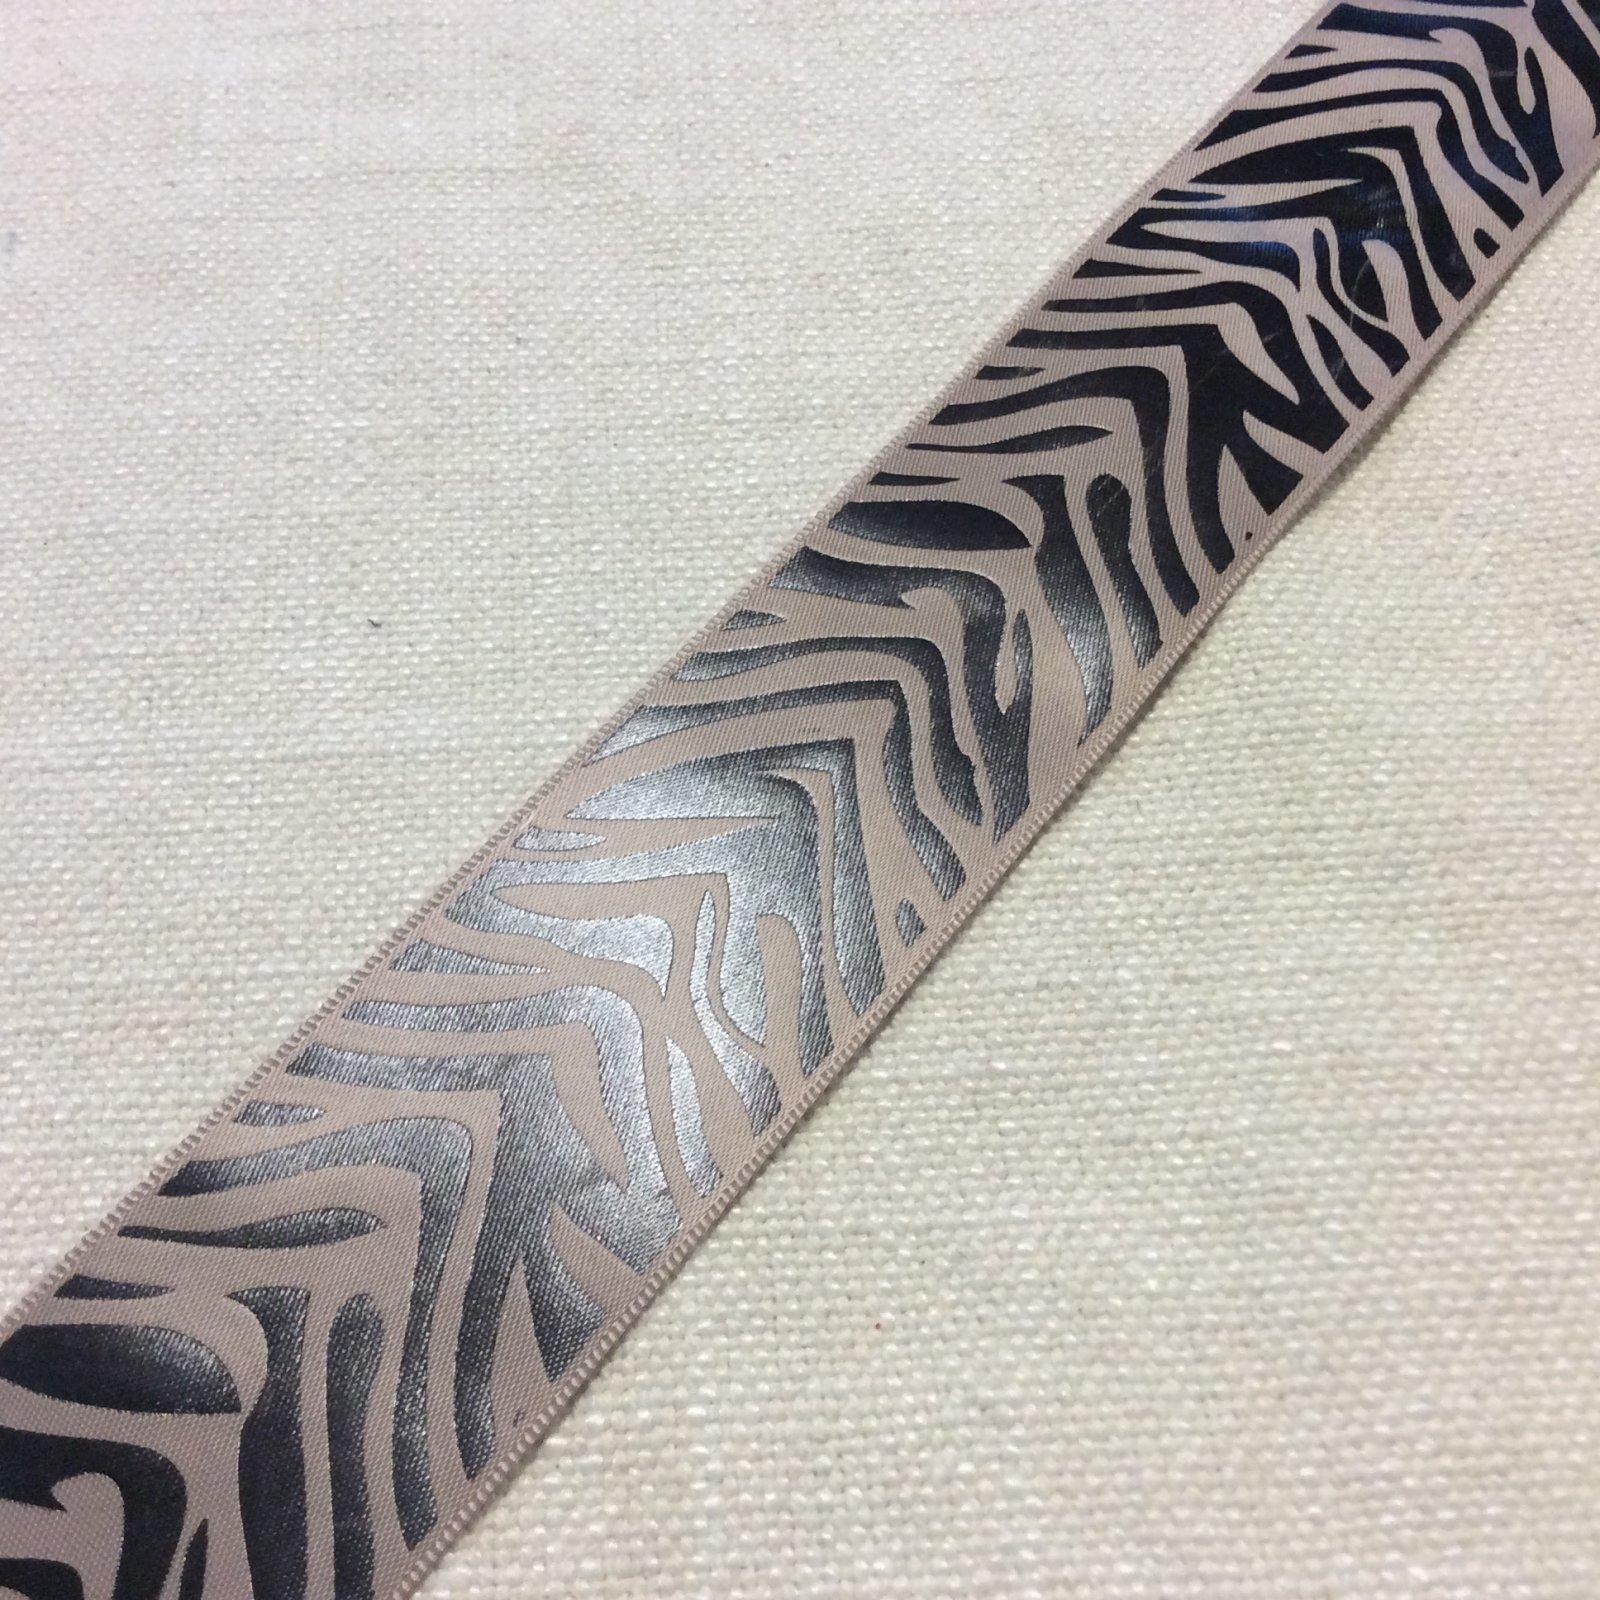 Satin Ribbon 1.5 Taupe and Black Zebra Animal Print Trim Ribbon RIB1273